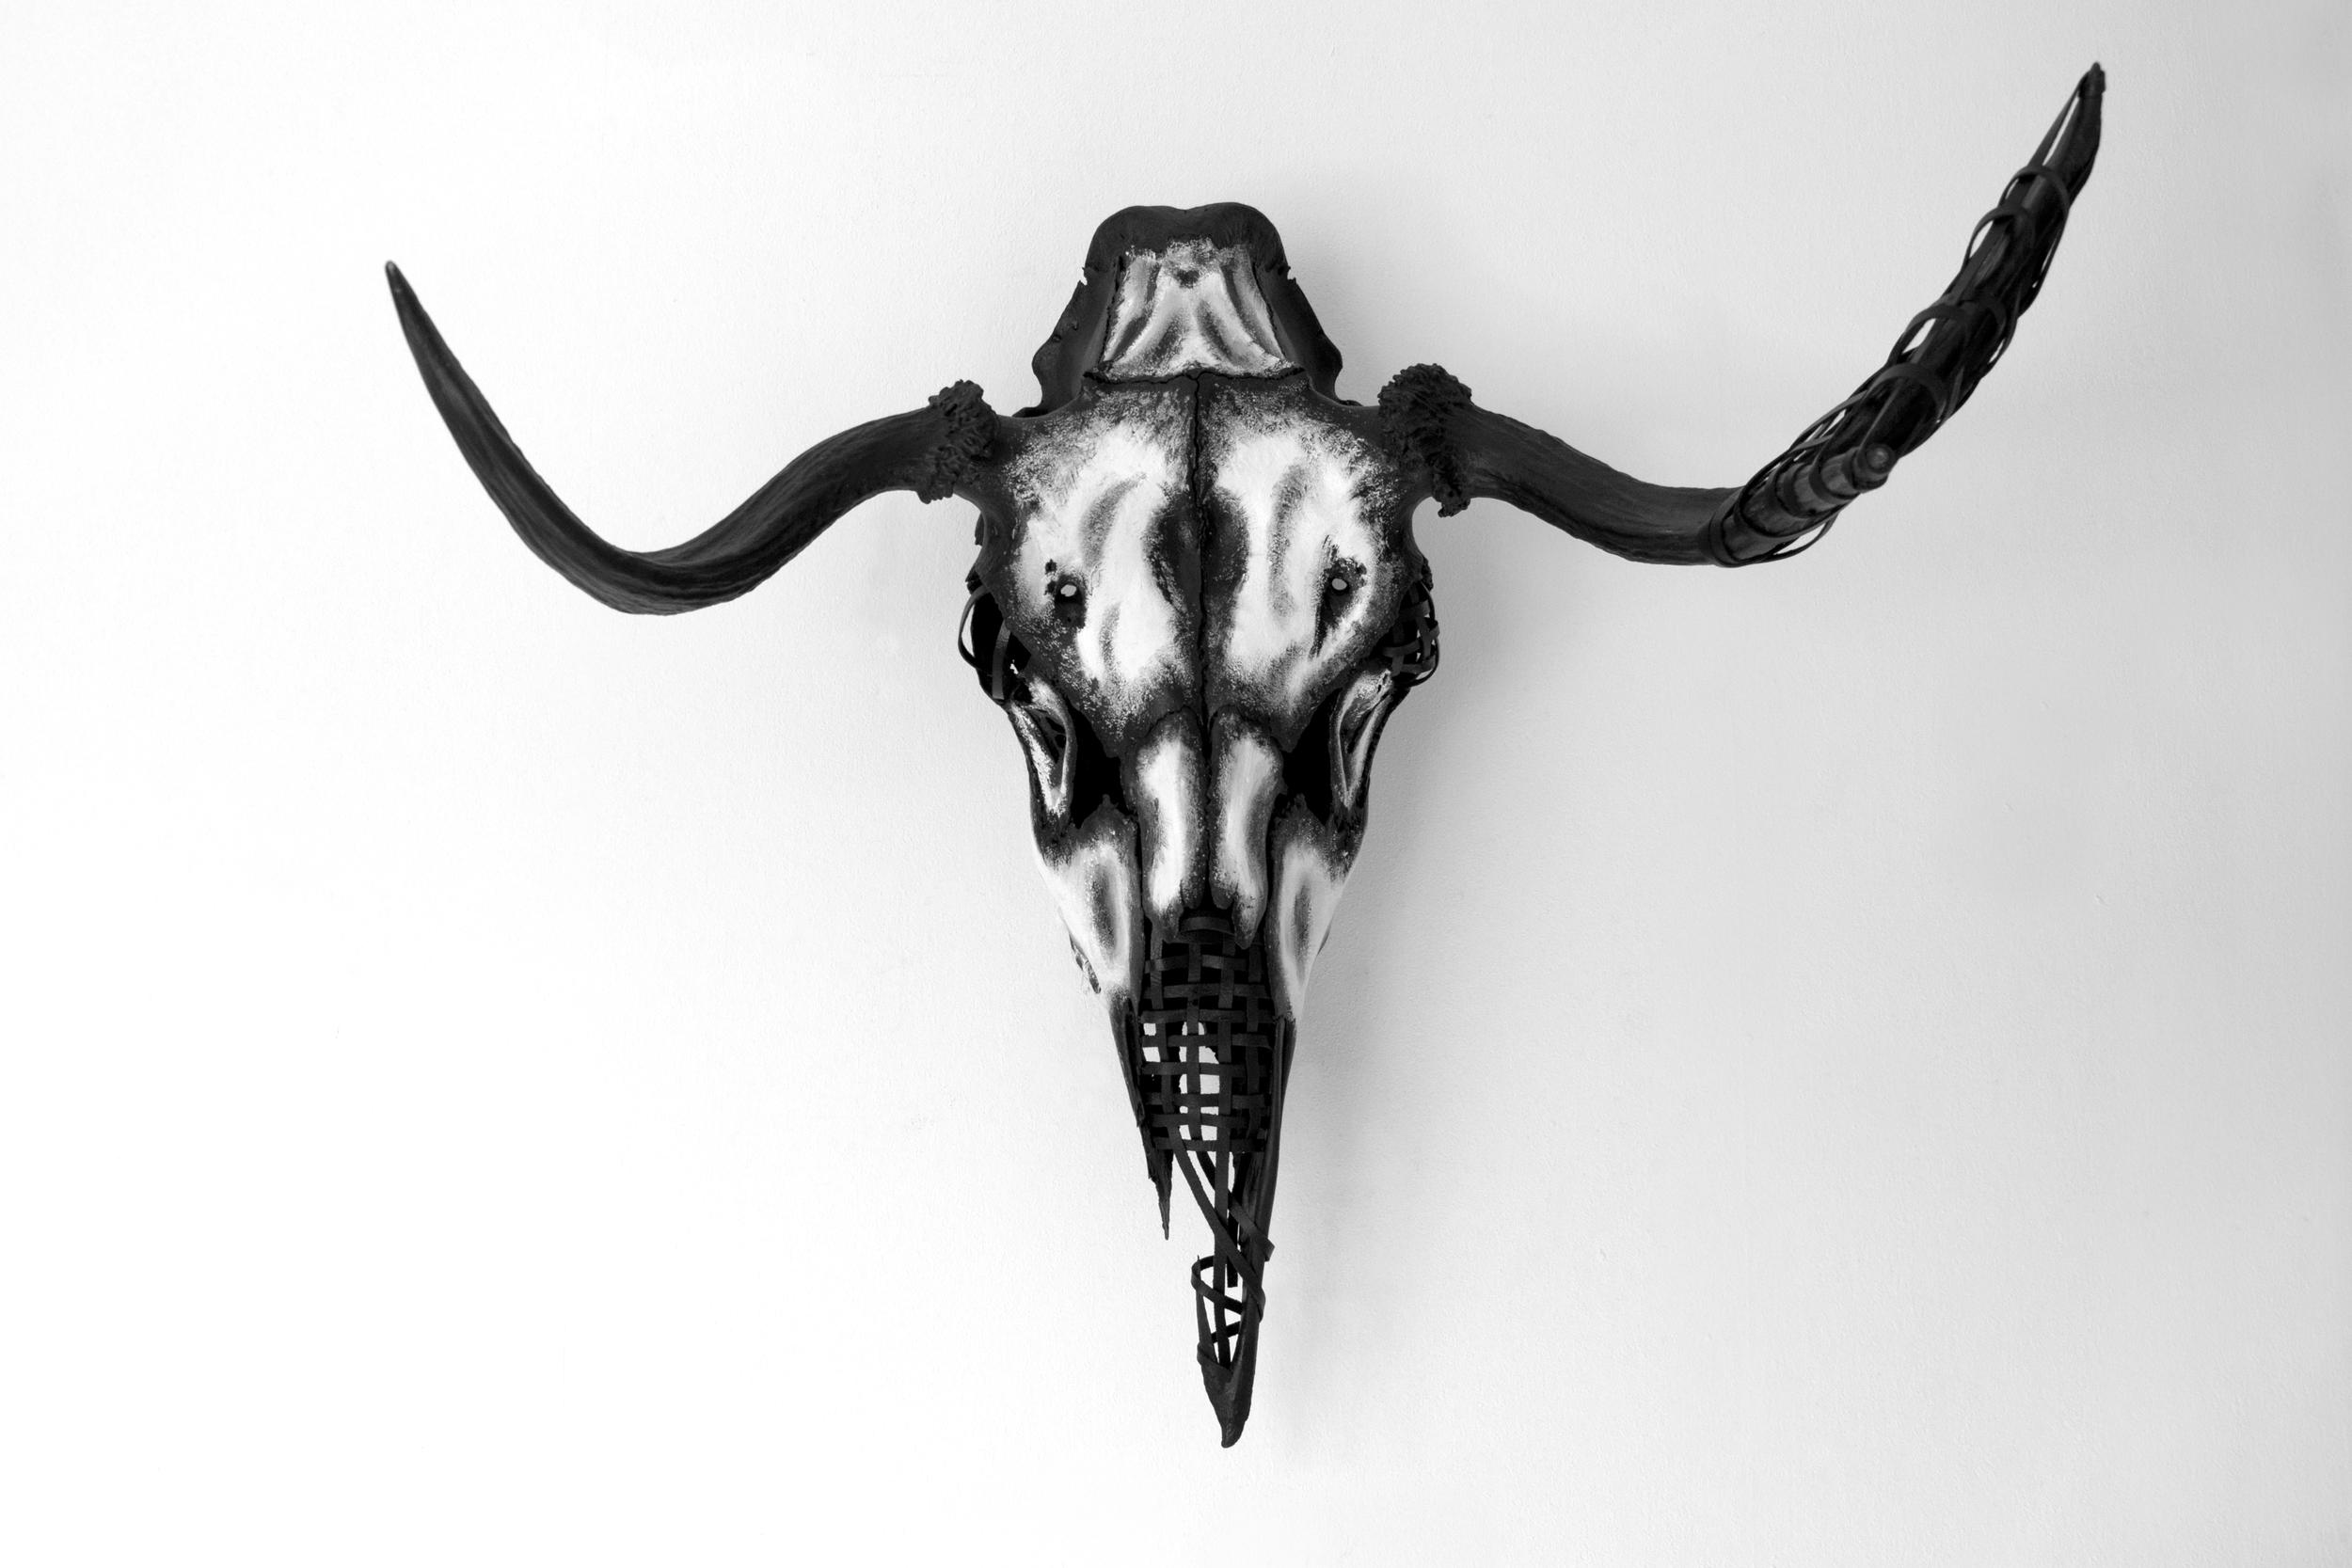 petra-shara-stoor-skull-art-vey-1.png